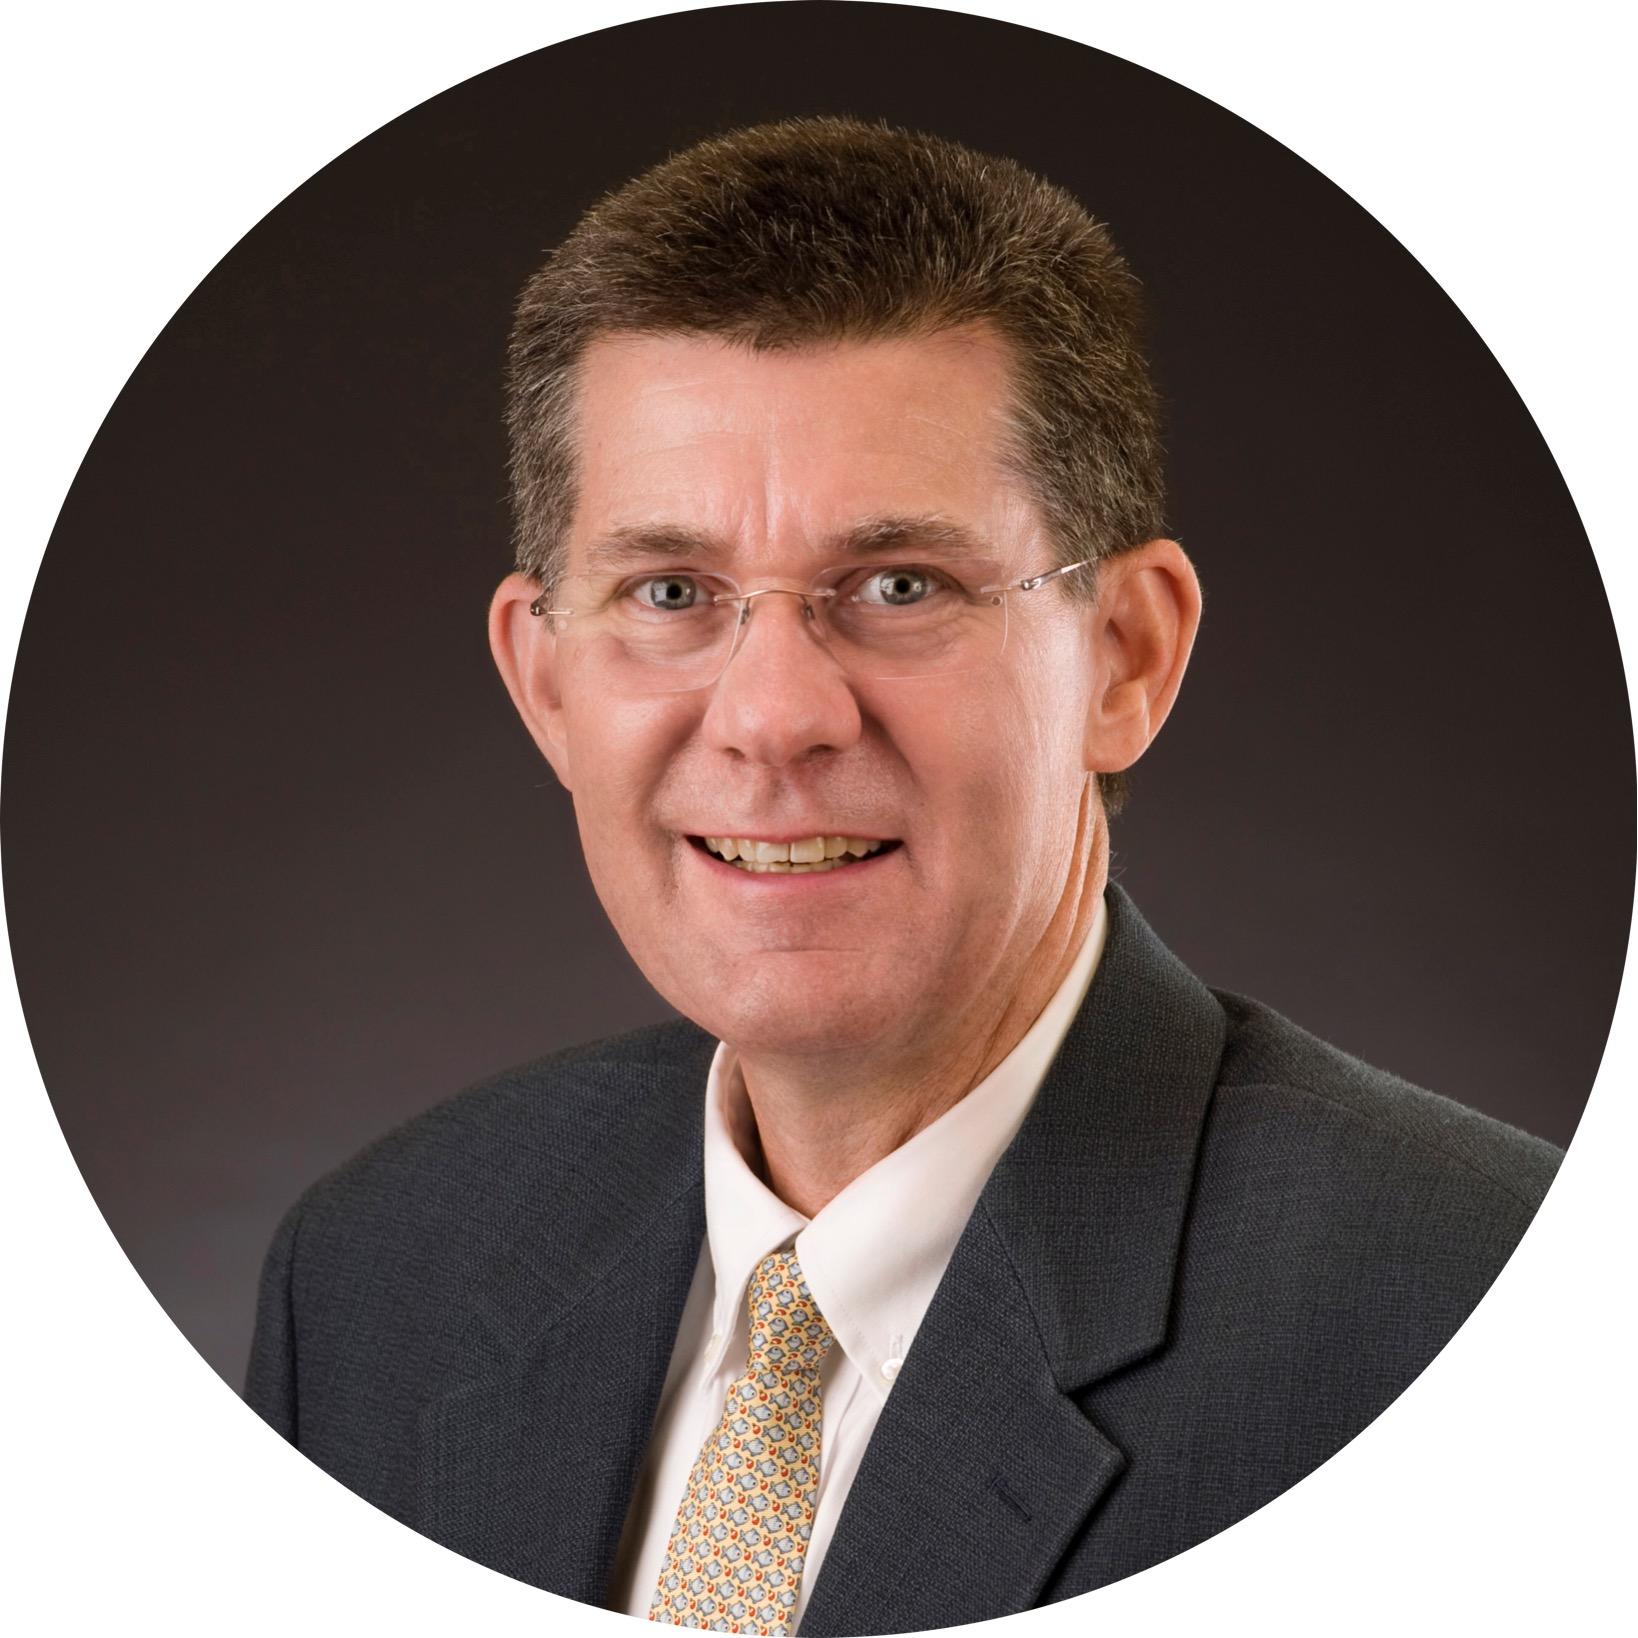 Myron Leirwetter - MemberMedical Director, Blue Cross Blue Shield of Kansas